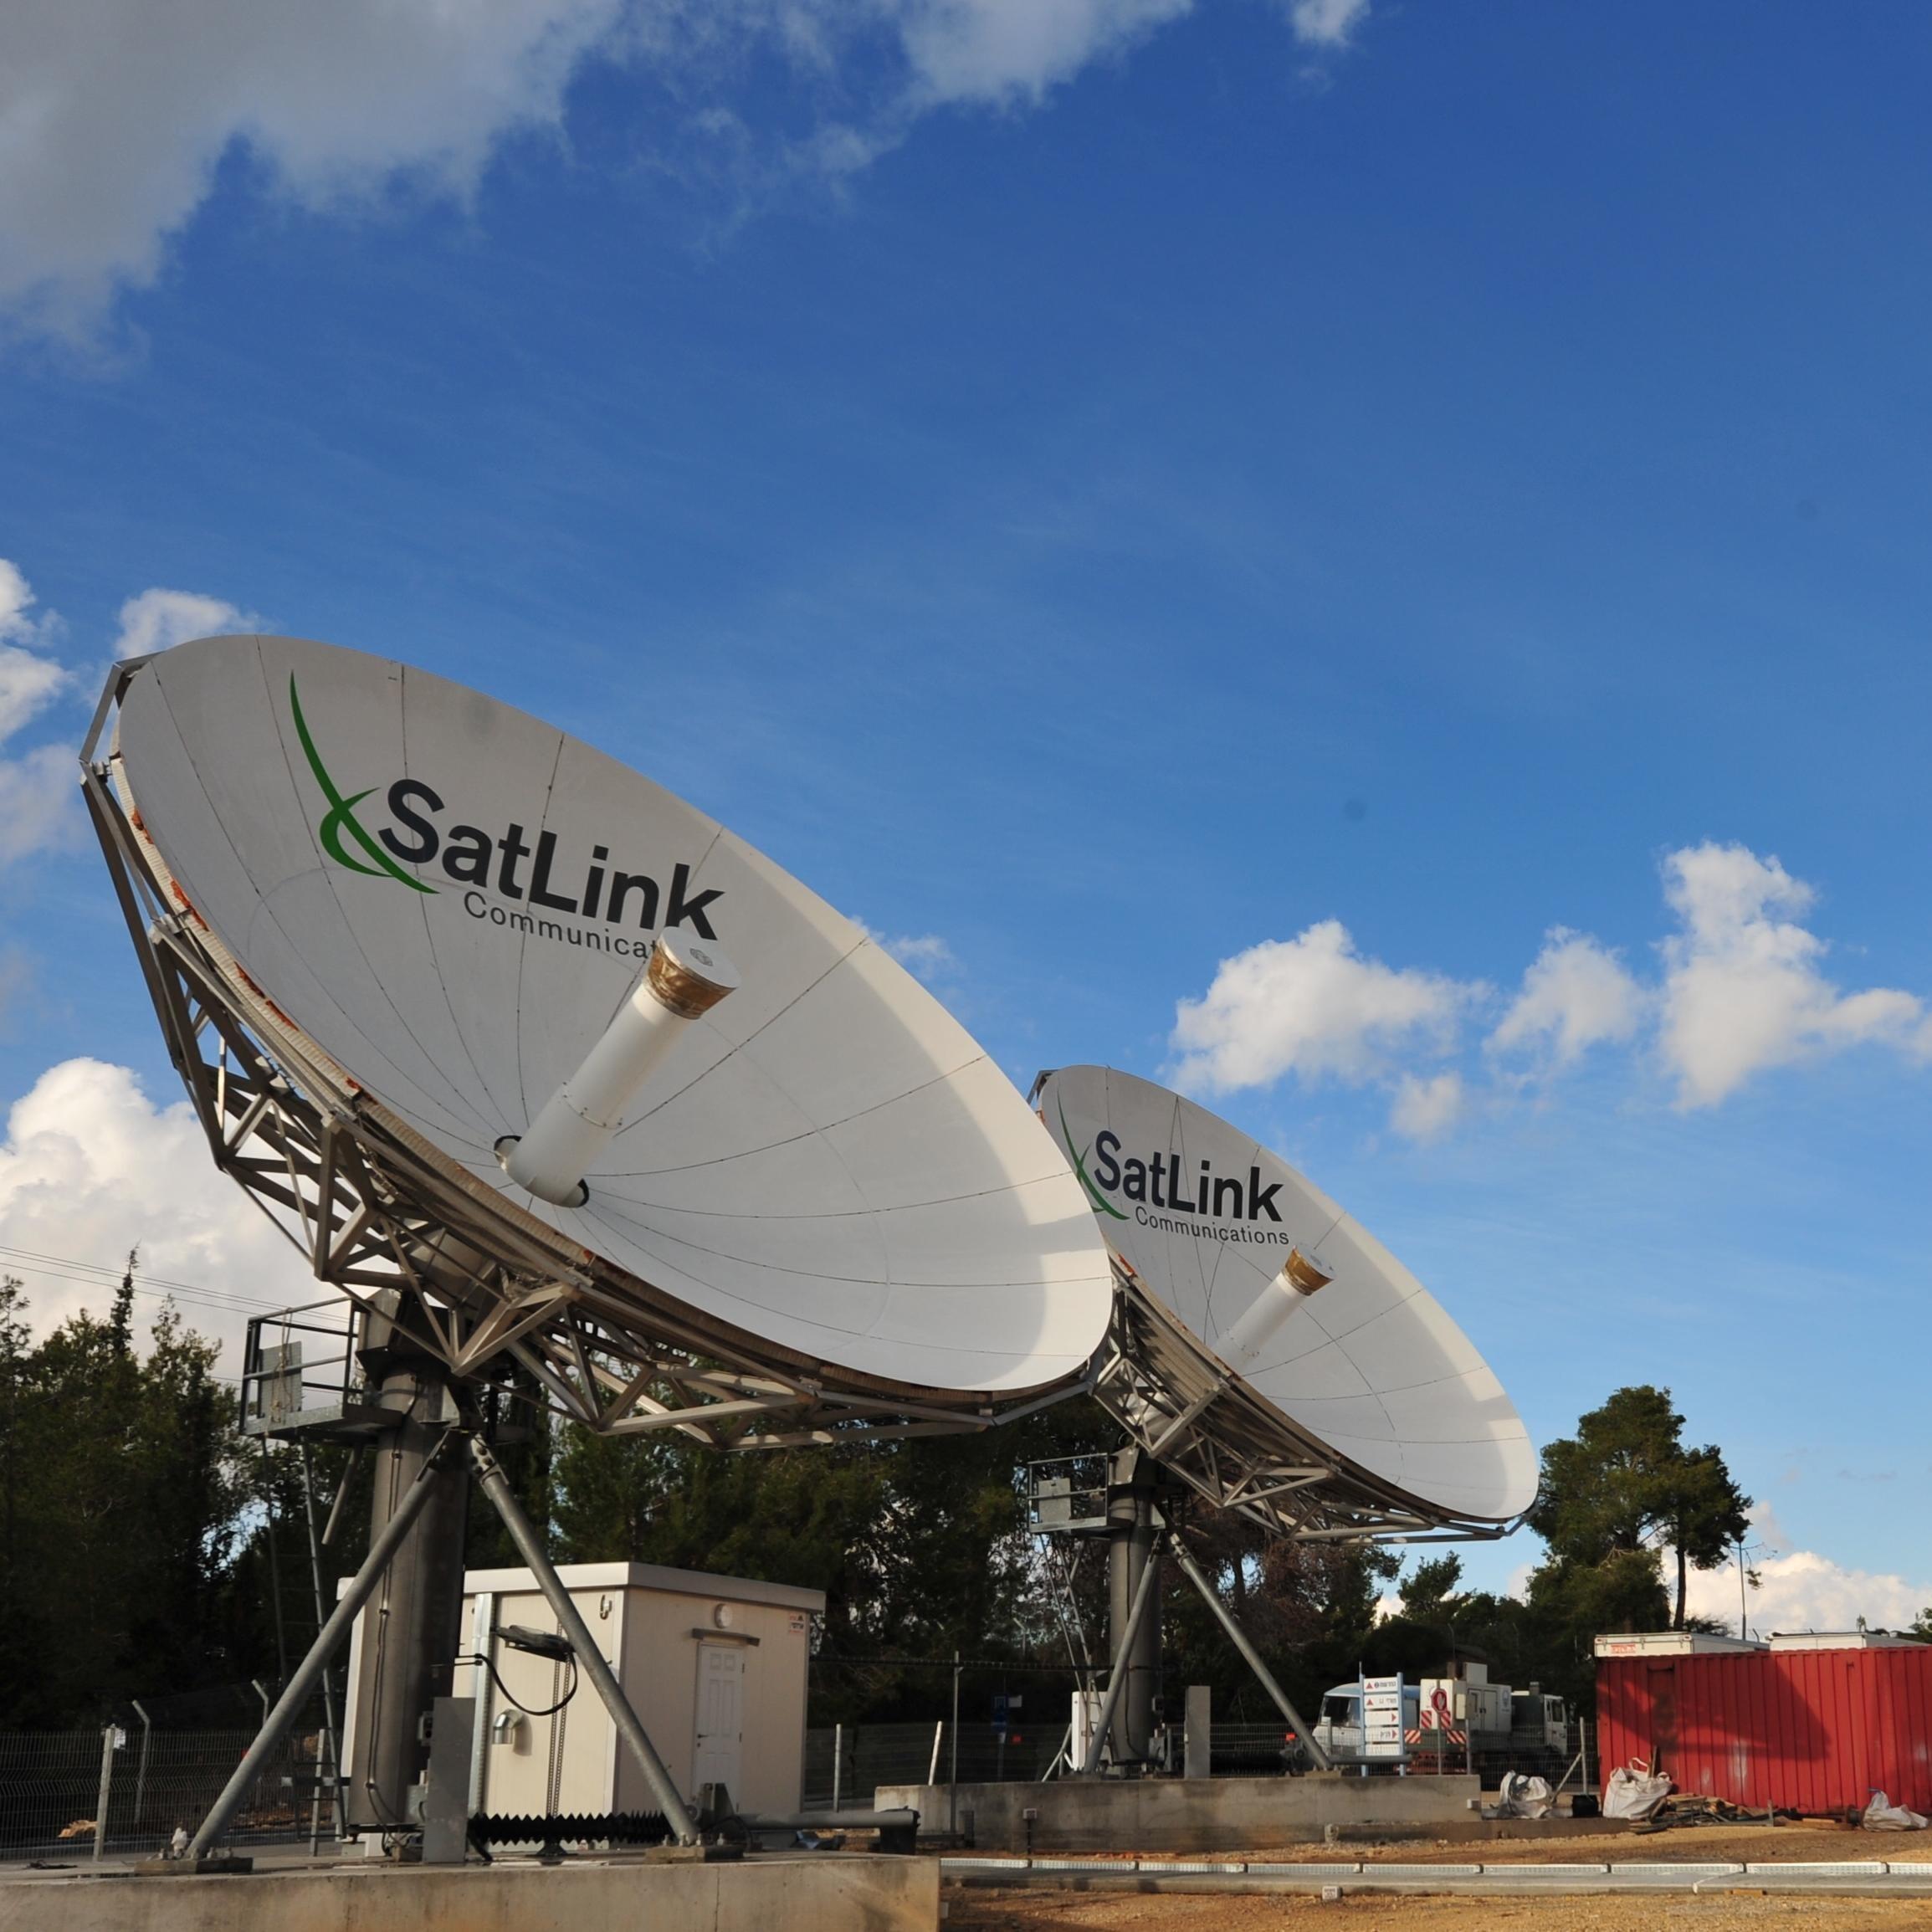 SatLink Communicatio